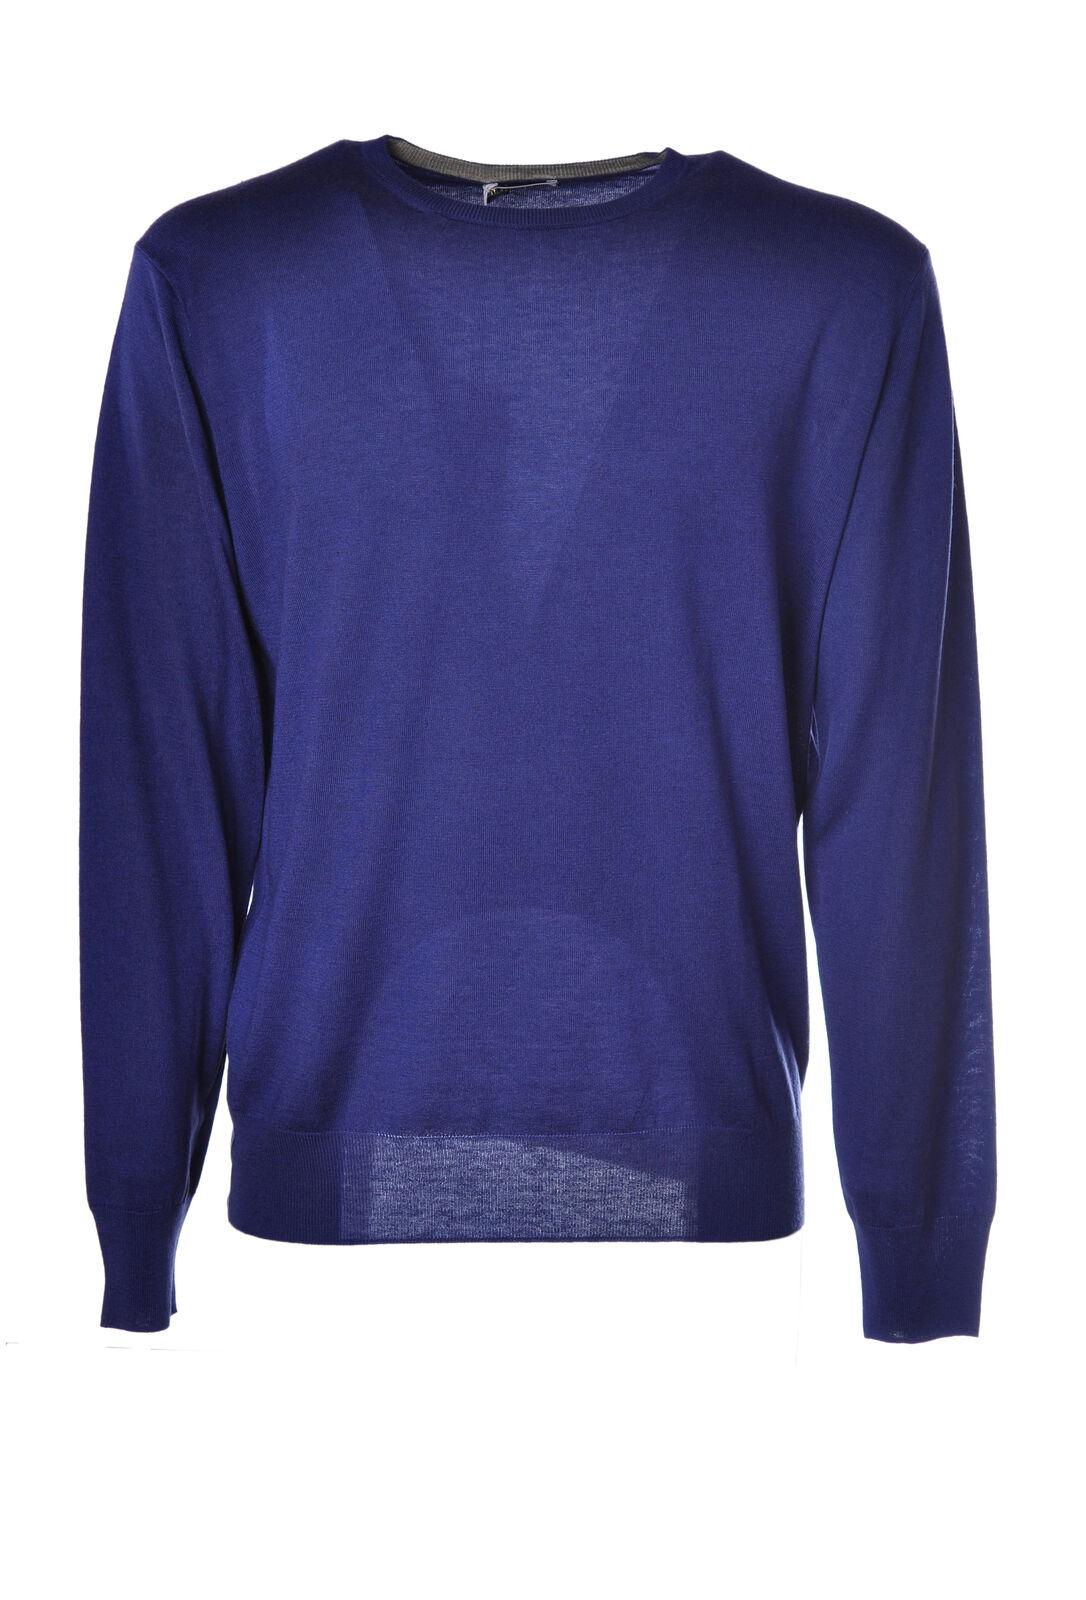 Heritage - Knitwear-Sweaters - Man - Blau - 1978223N184847